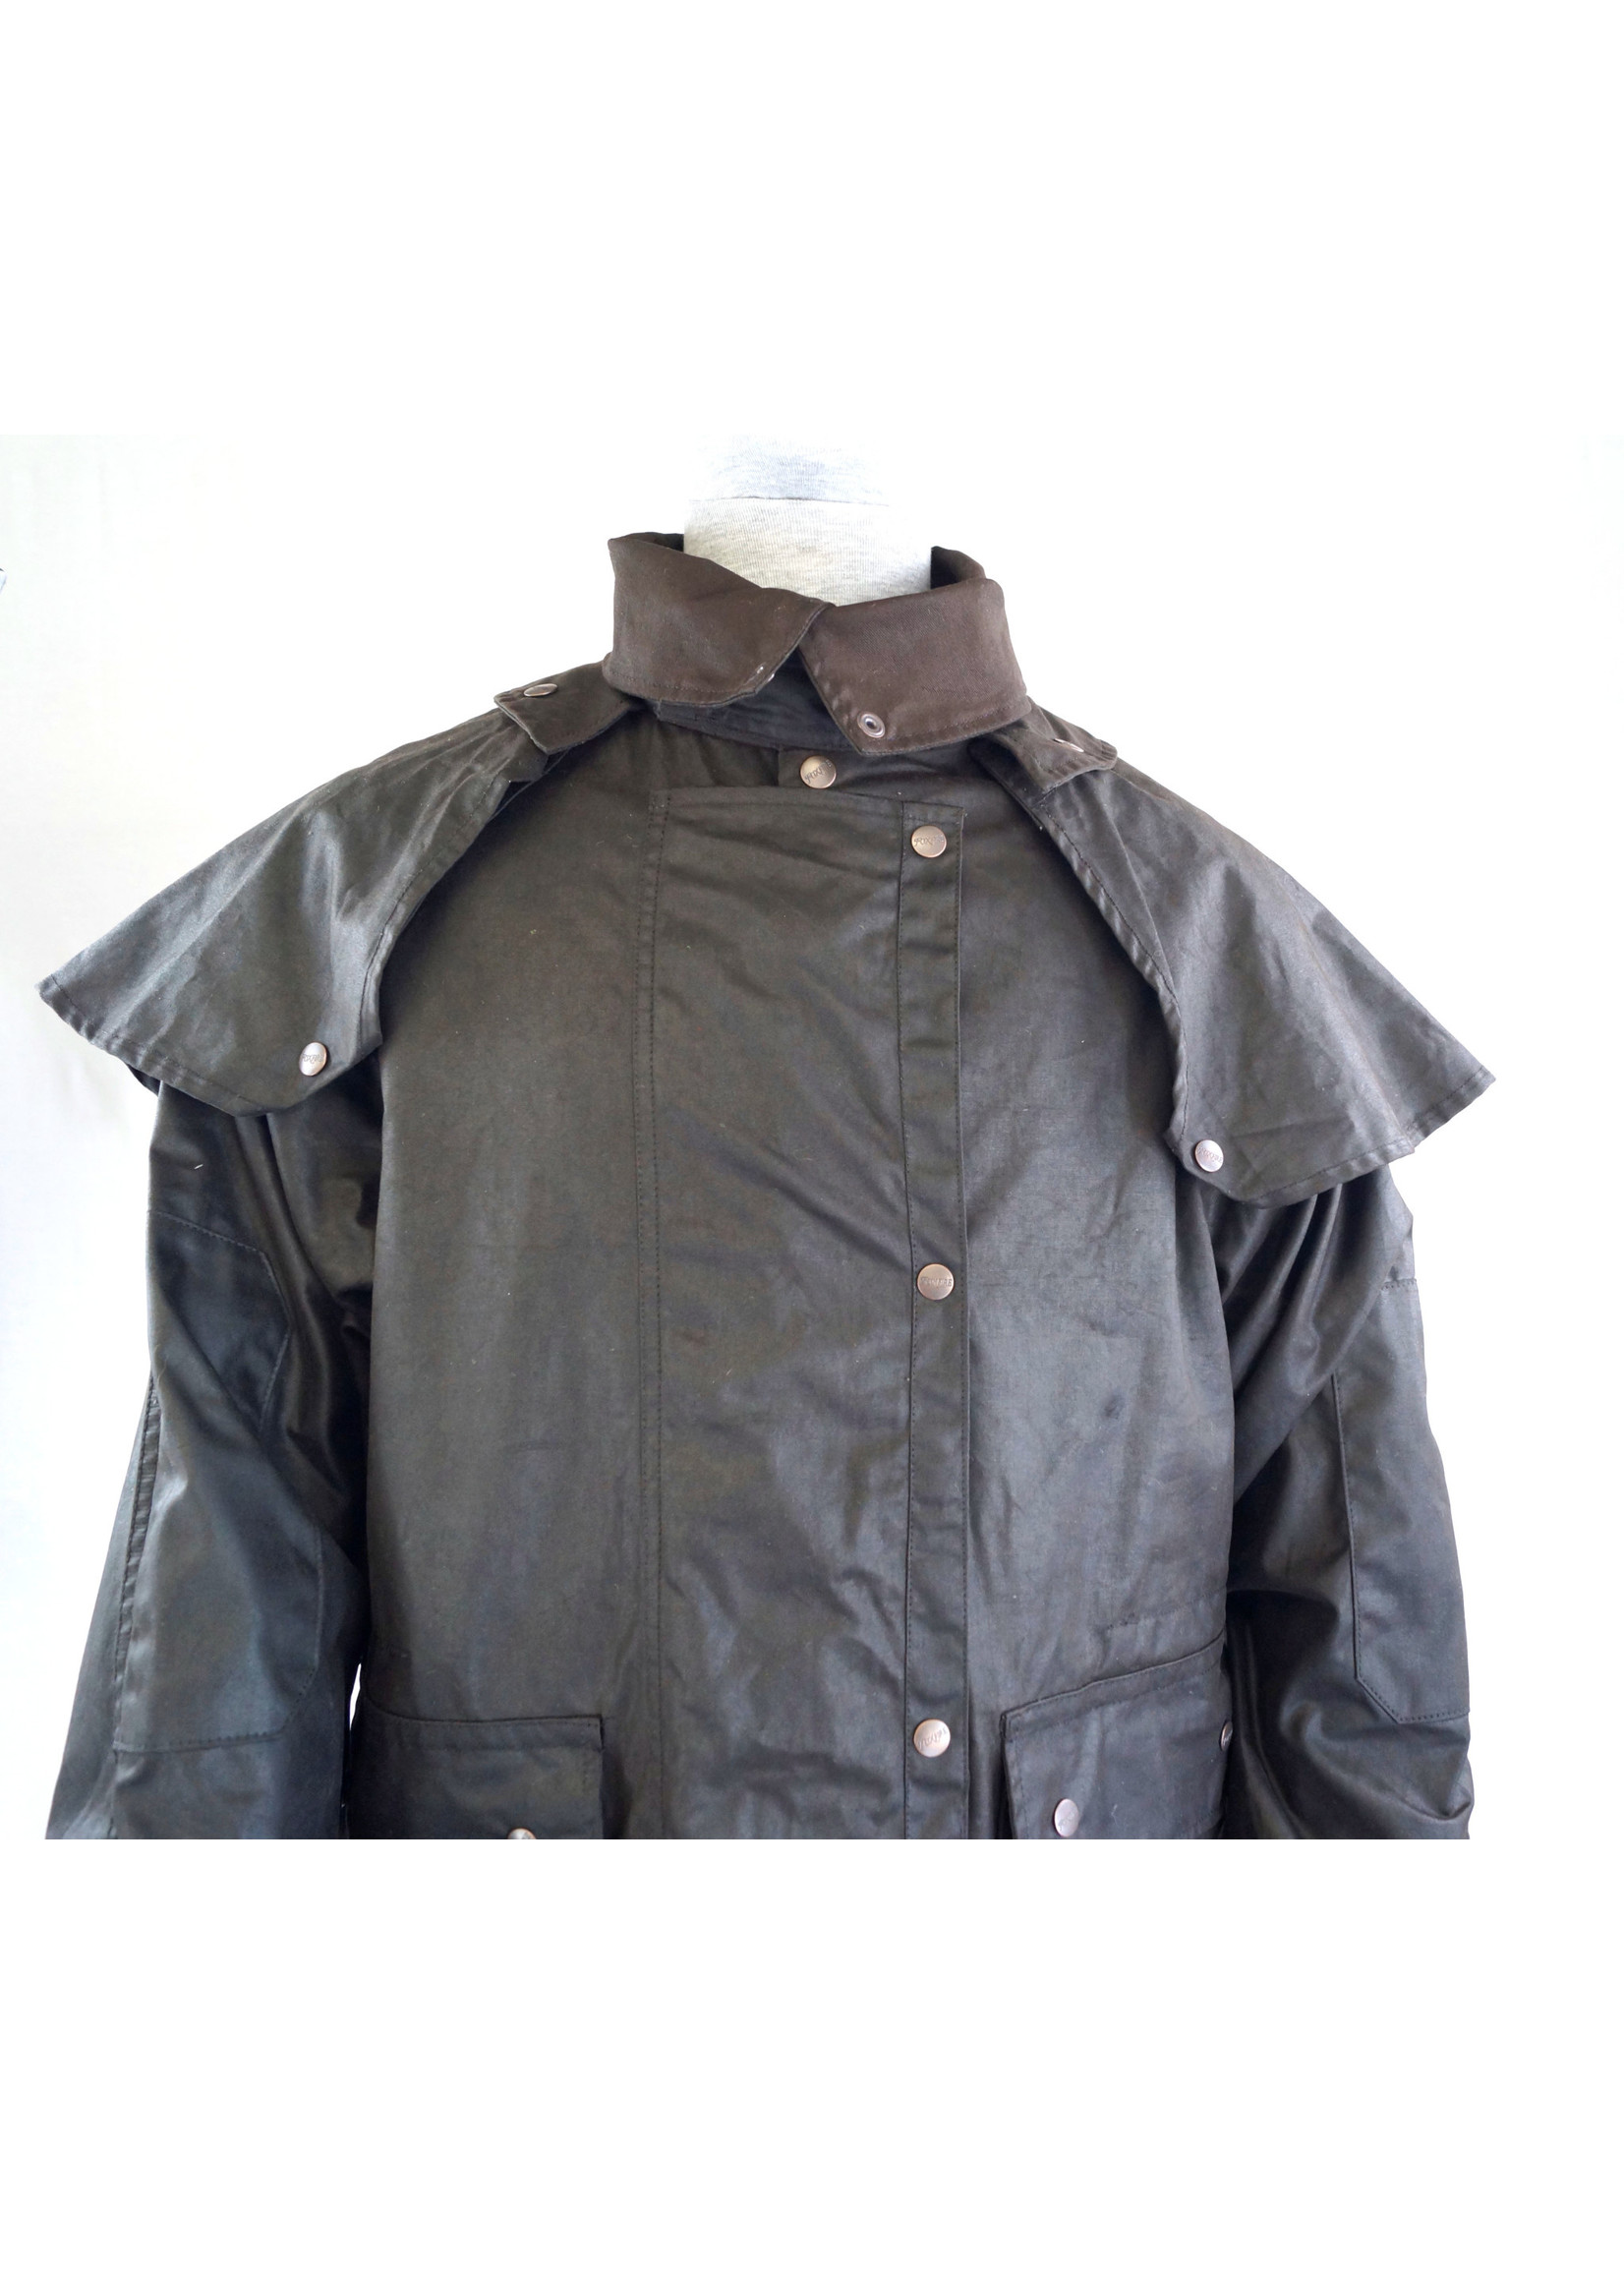 Brown Australian Outback Long Duster Jacket